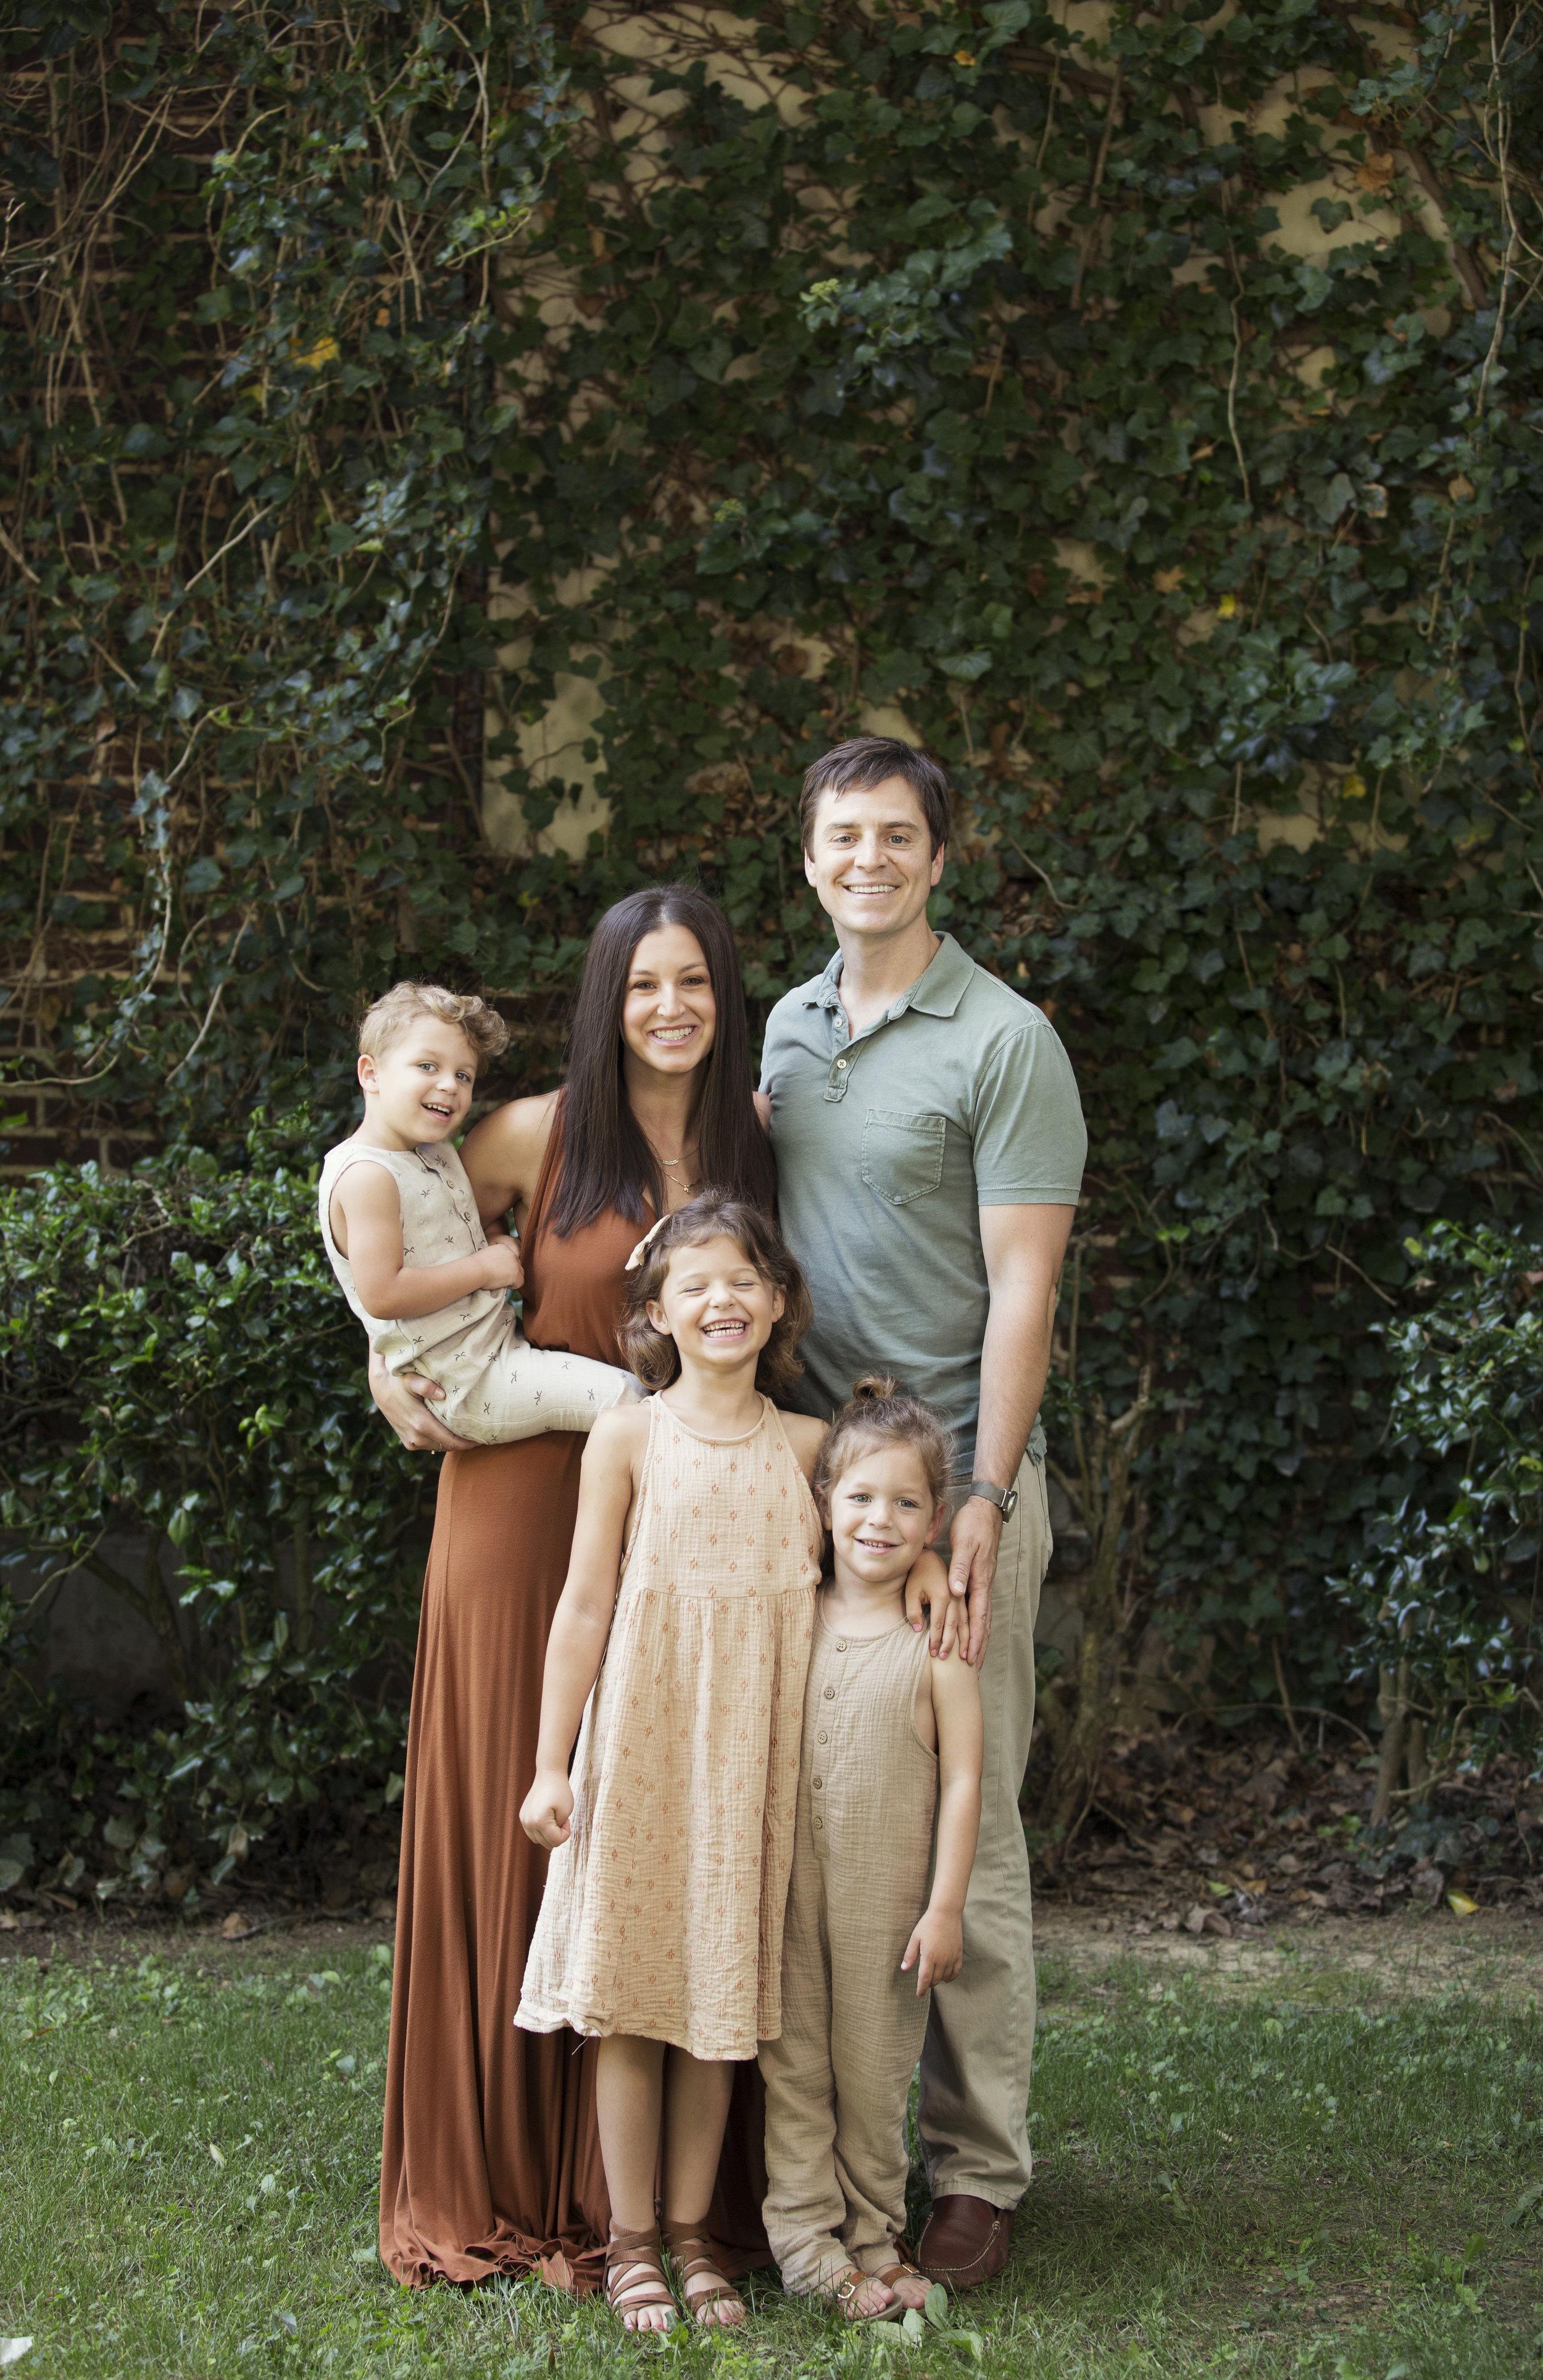 jessica-zimmerman-events-family-work-balance-twins.jpg